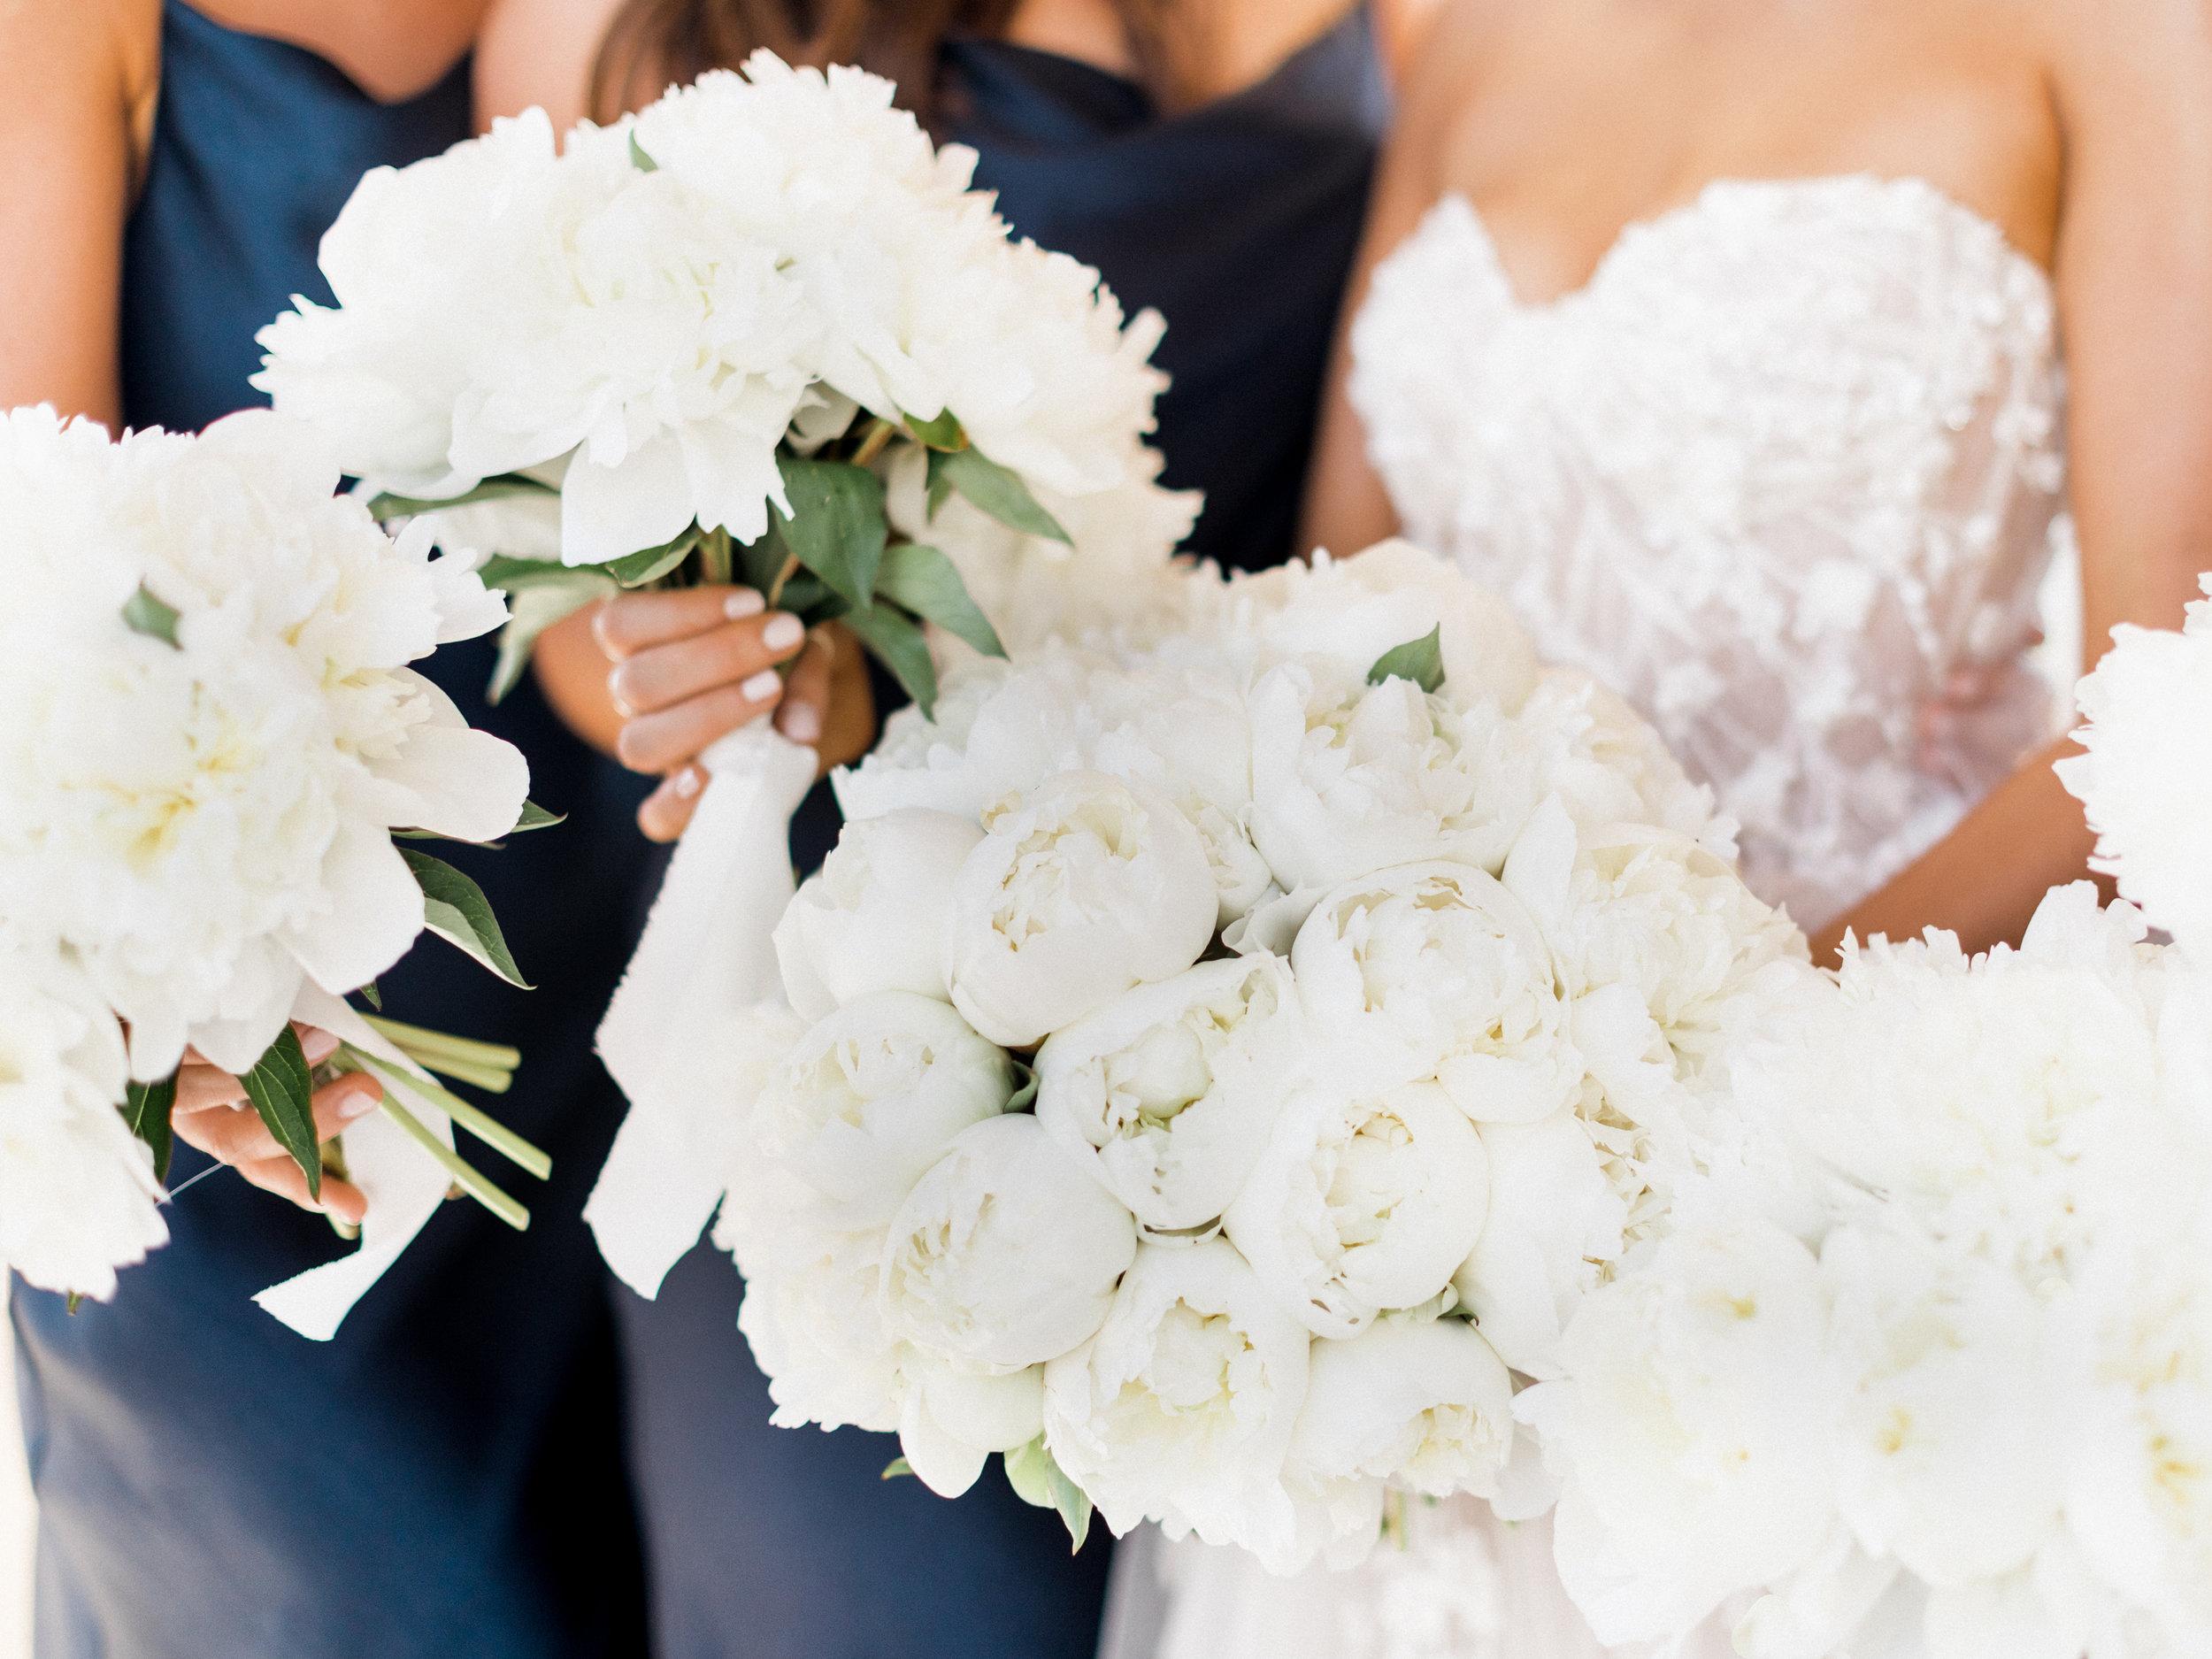 bastide_de_gordes_provence_wedding_(c)_rory-wylie-45.jpg